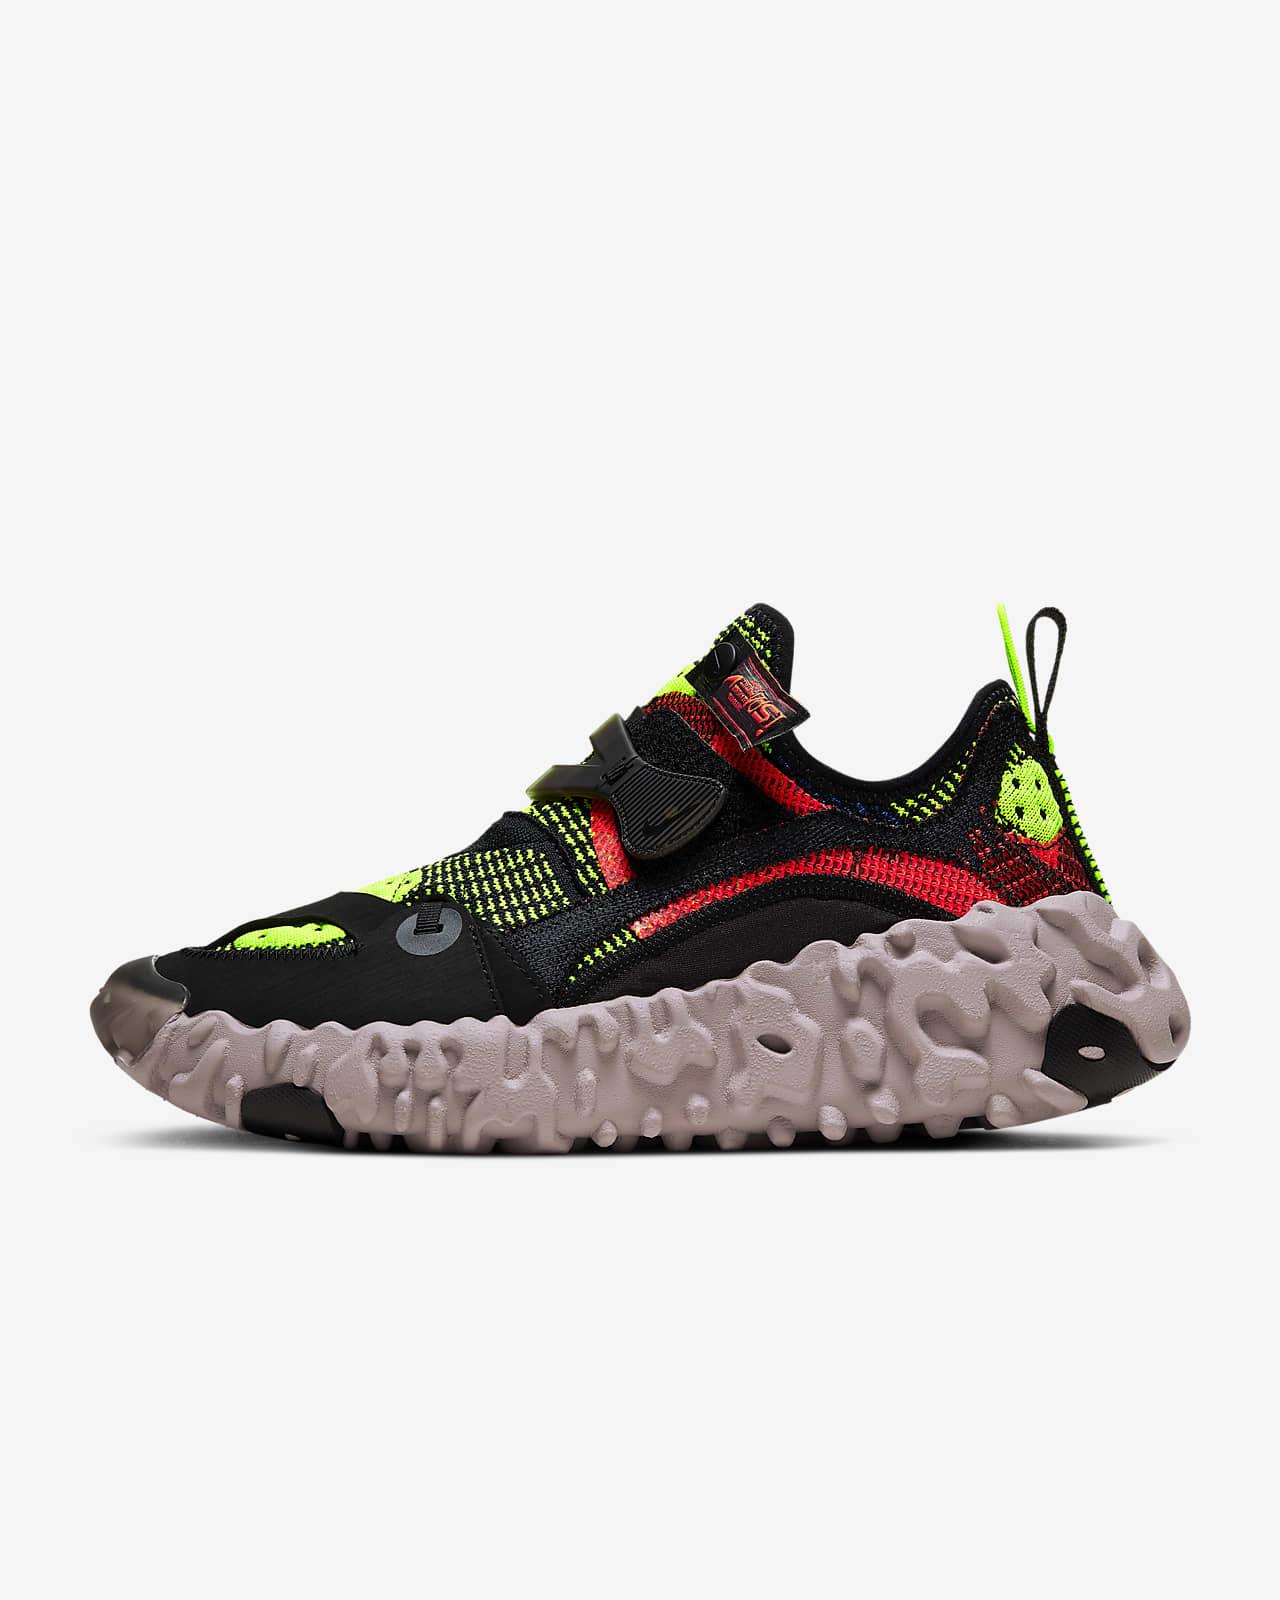 Nike ISPA OverReact FlyKnit herresko